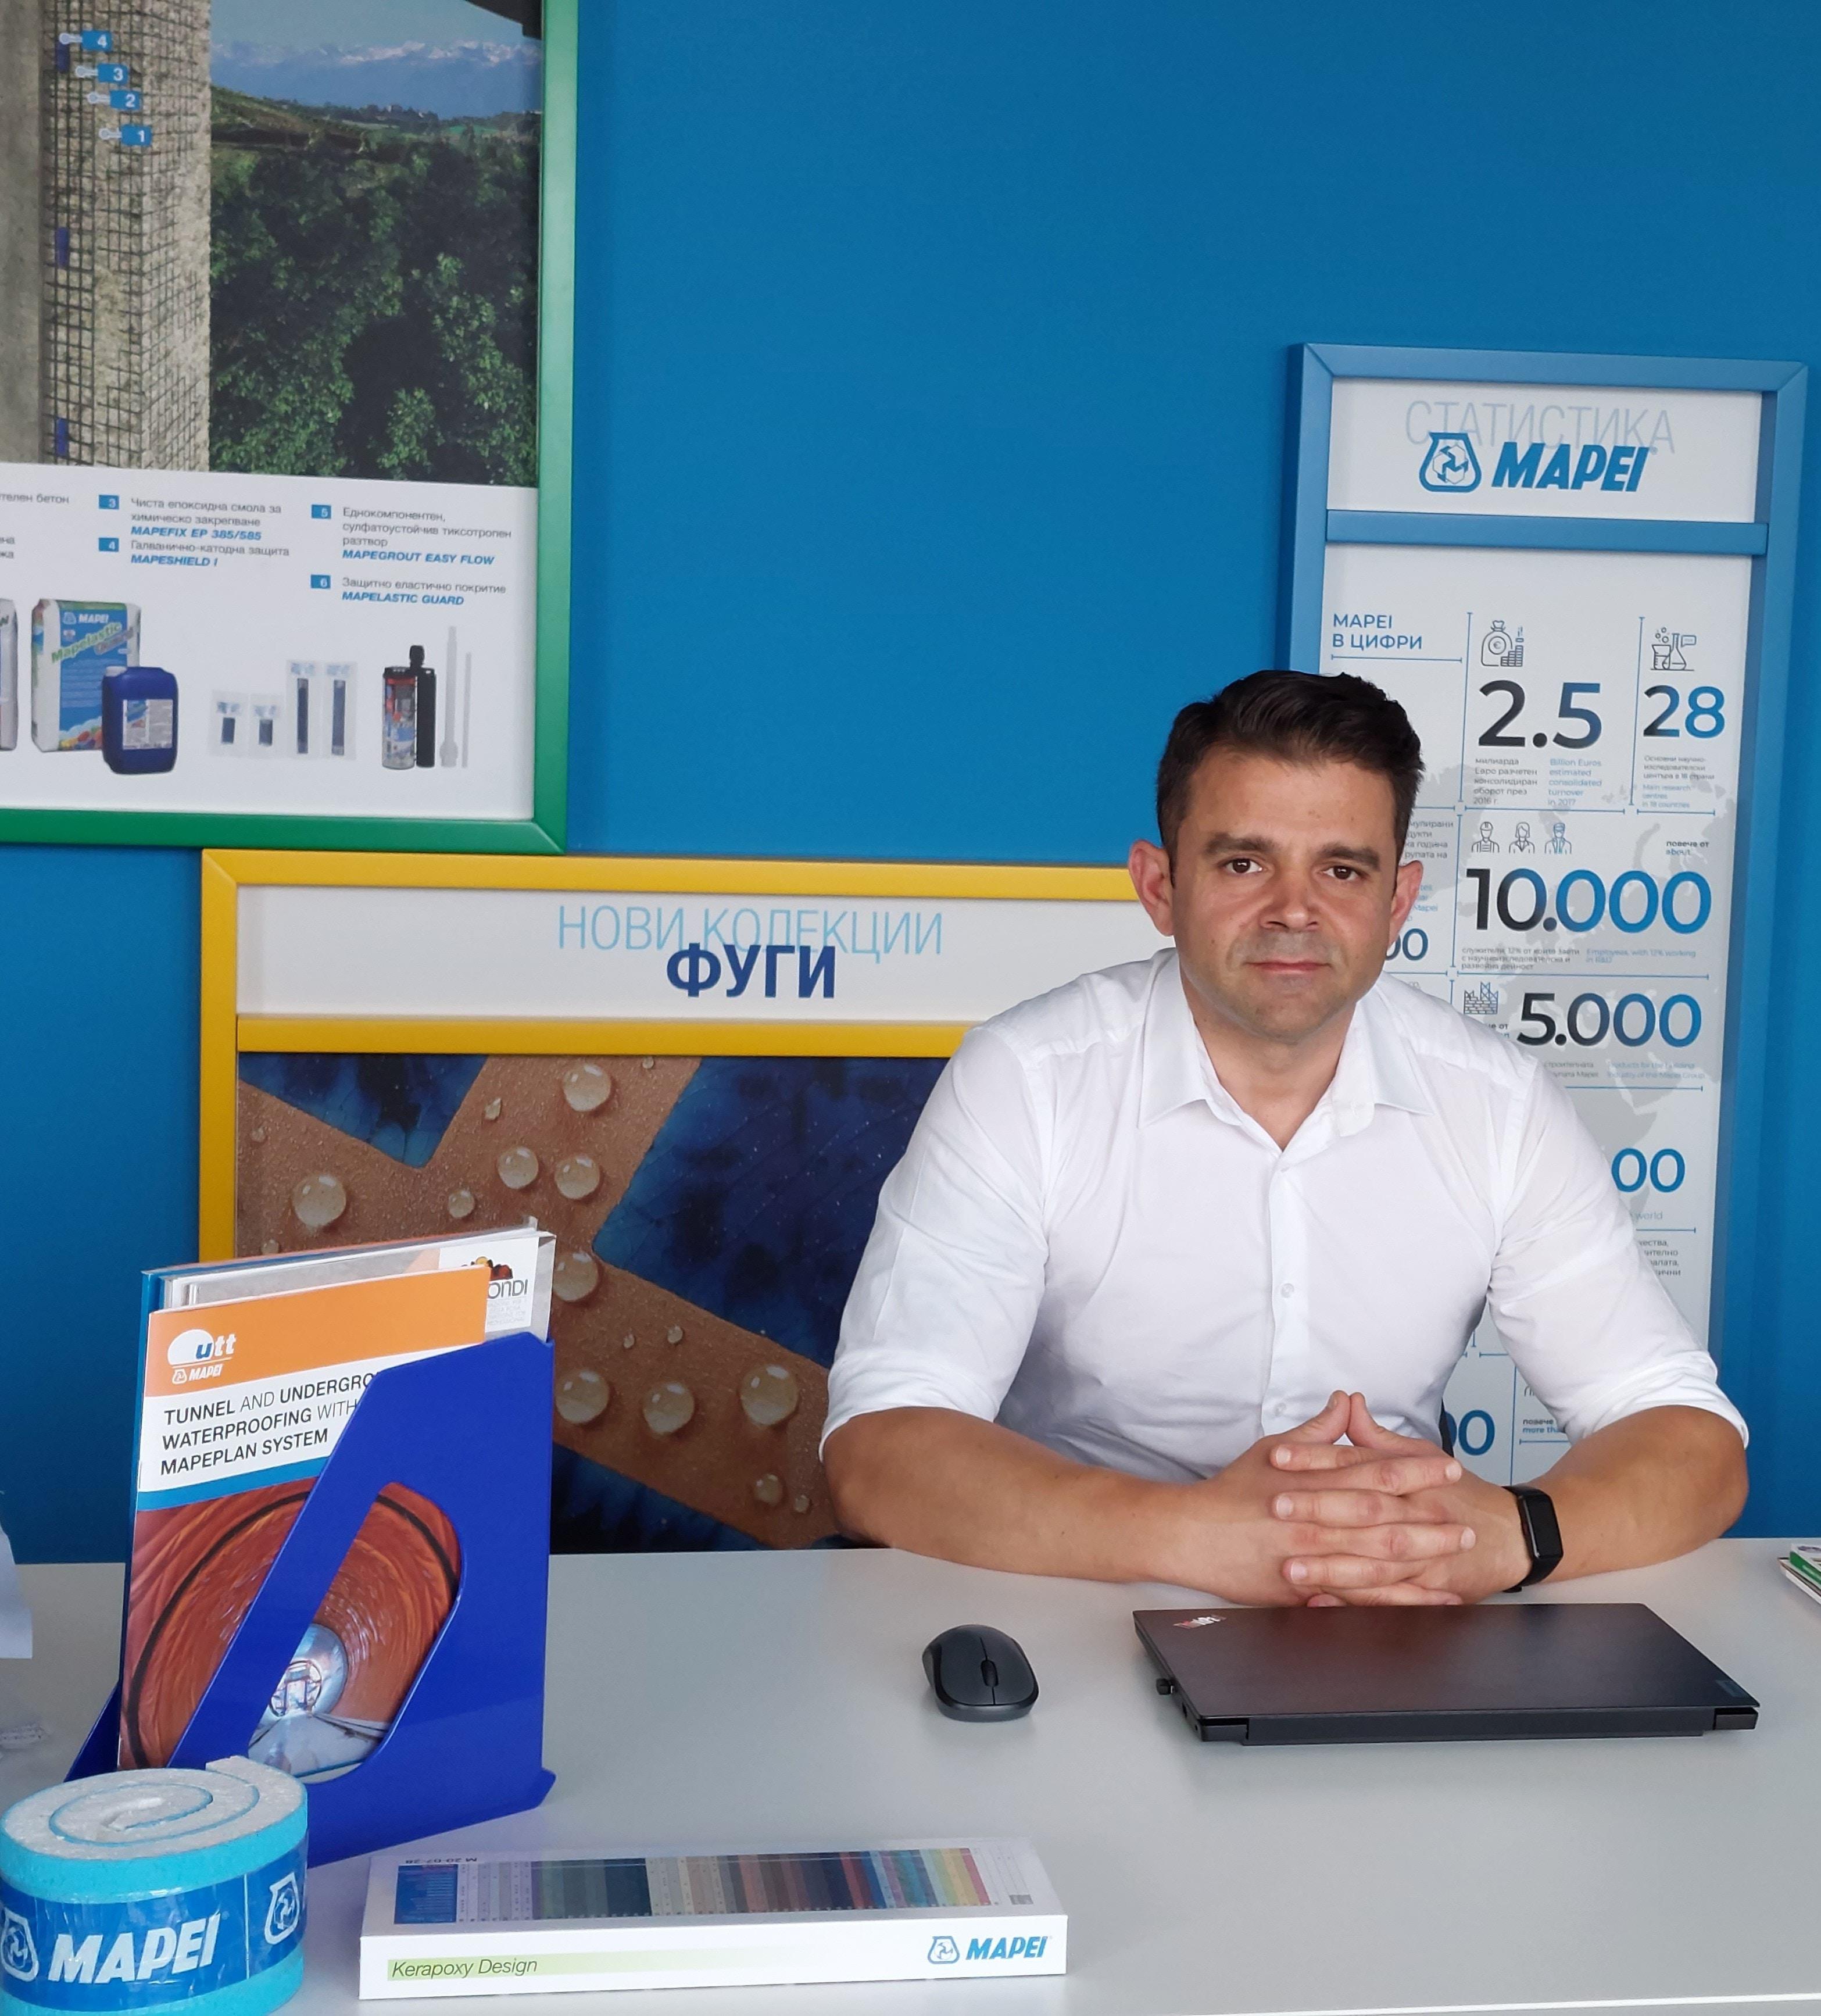 Martin Stoyanov Technical manager